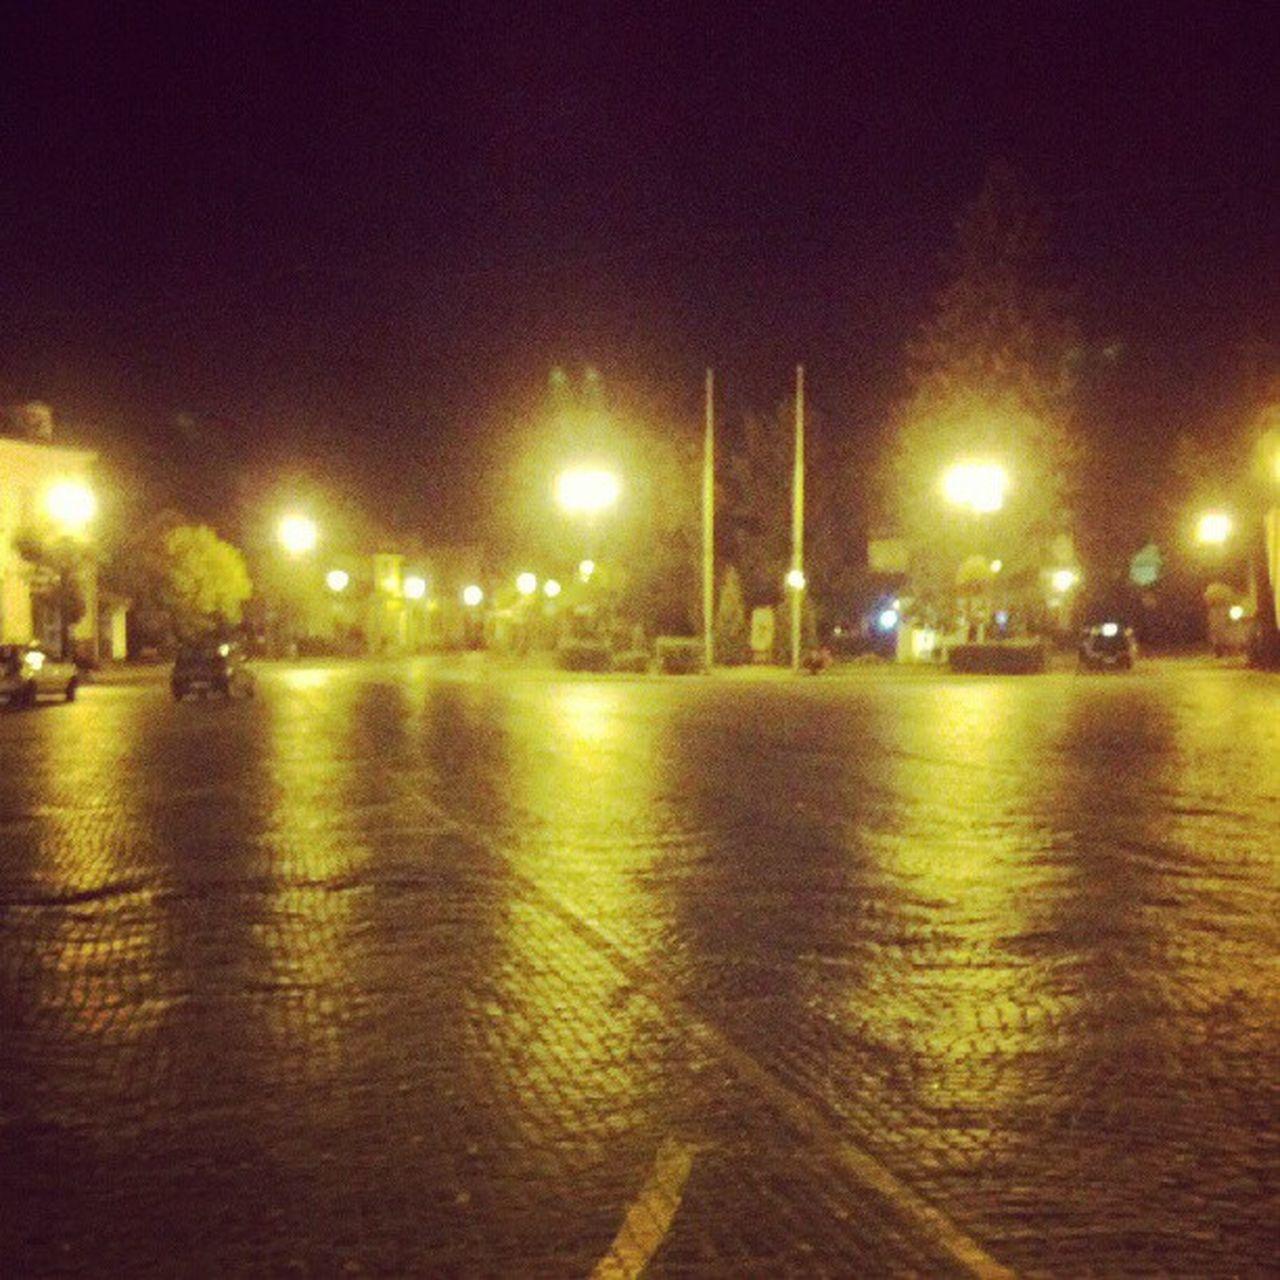 VIEW OF ILLUMINATED STREET LIGHT AT NIGHT